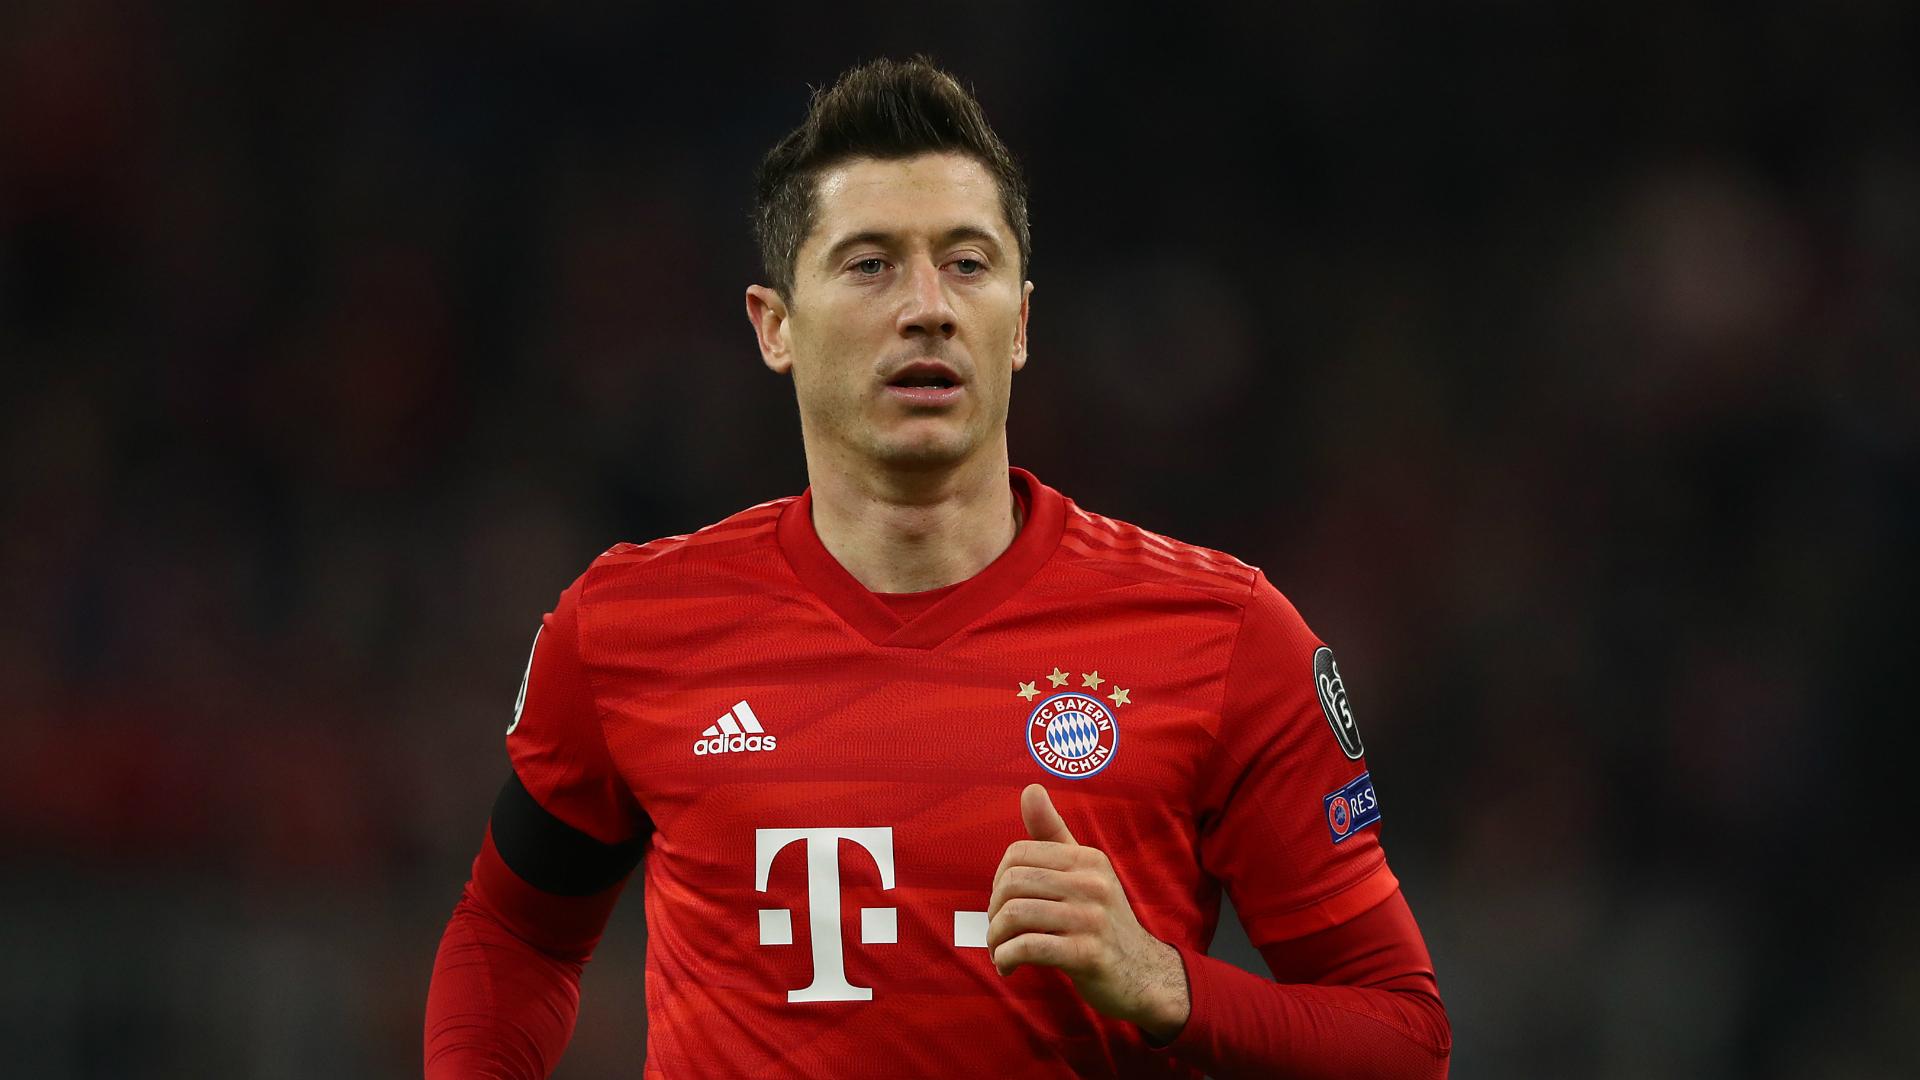 Lewandowski tells Bayern's 'reserved' young players to show leadership